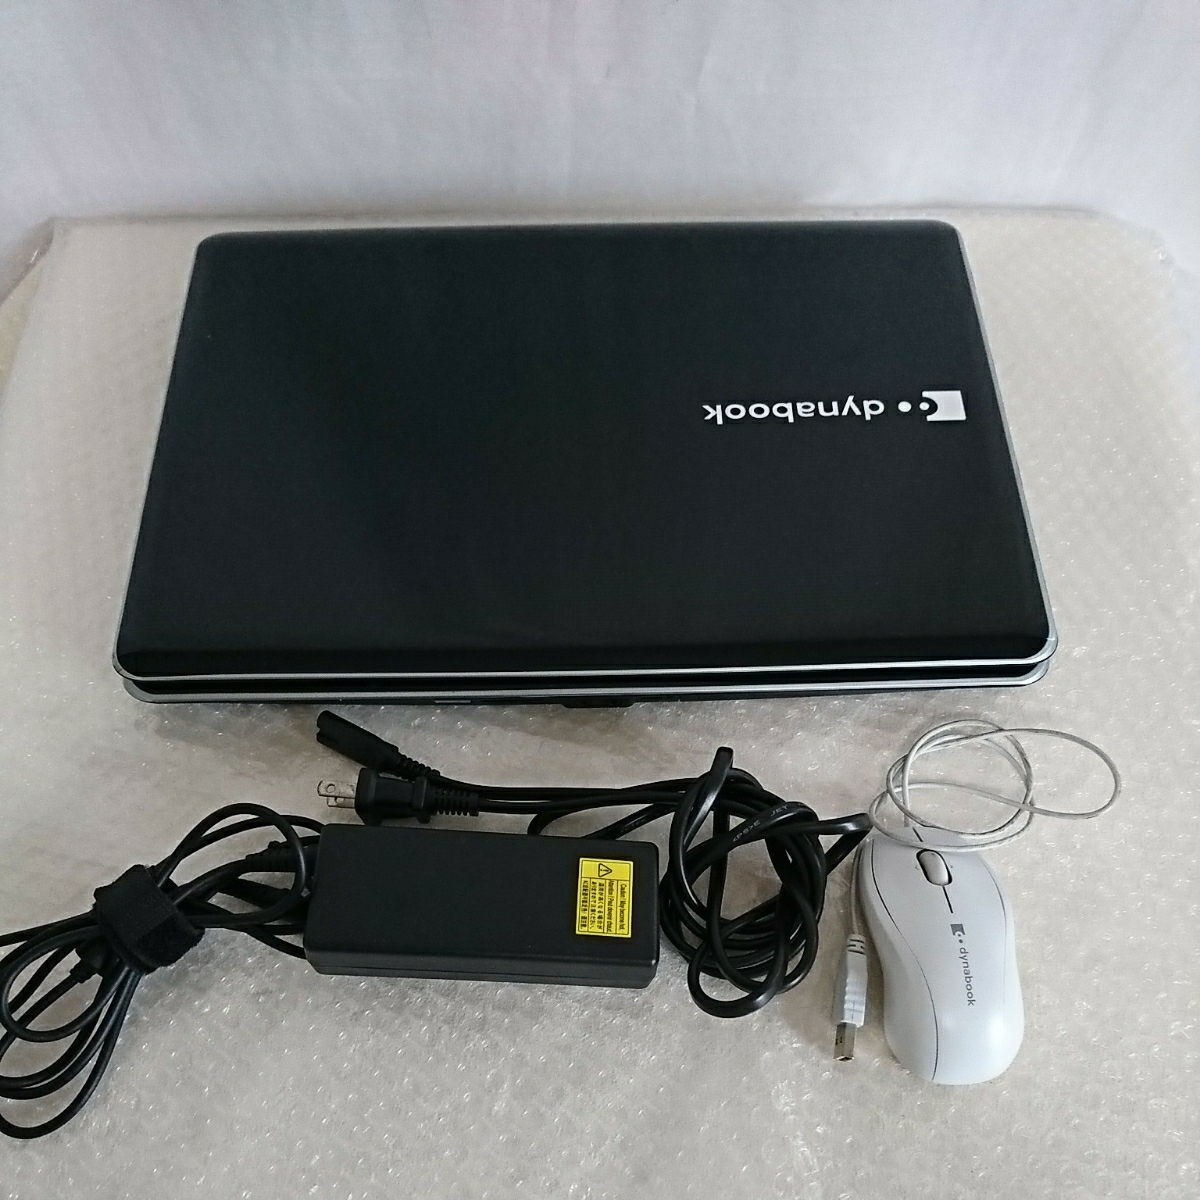 TOSHIBA 東芝 dynabook AX/53HBL Celeron 2GB 16型ワイド液晶 DVDマルチ Windows Vista ノートパソコン _画像2